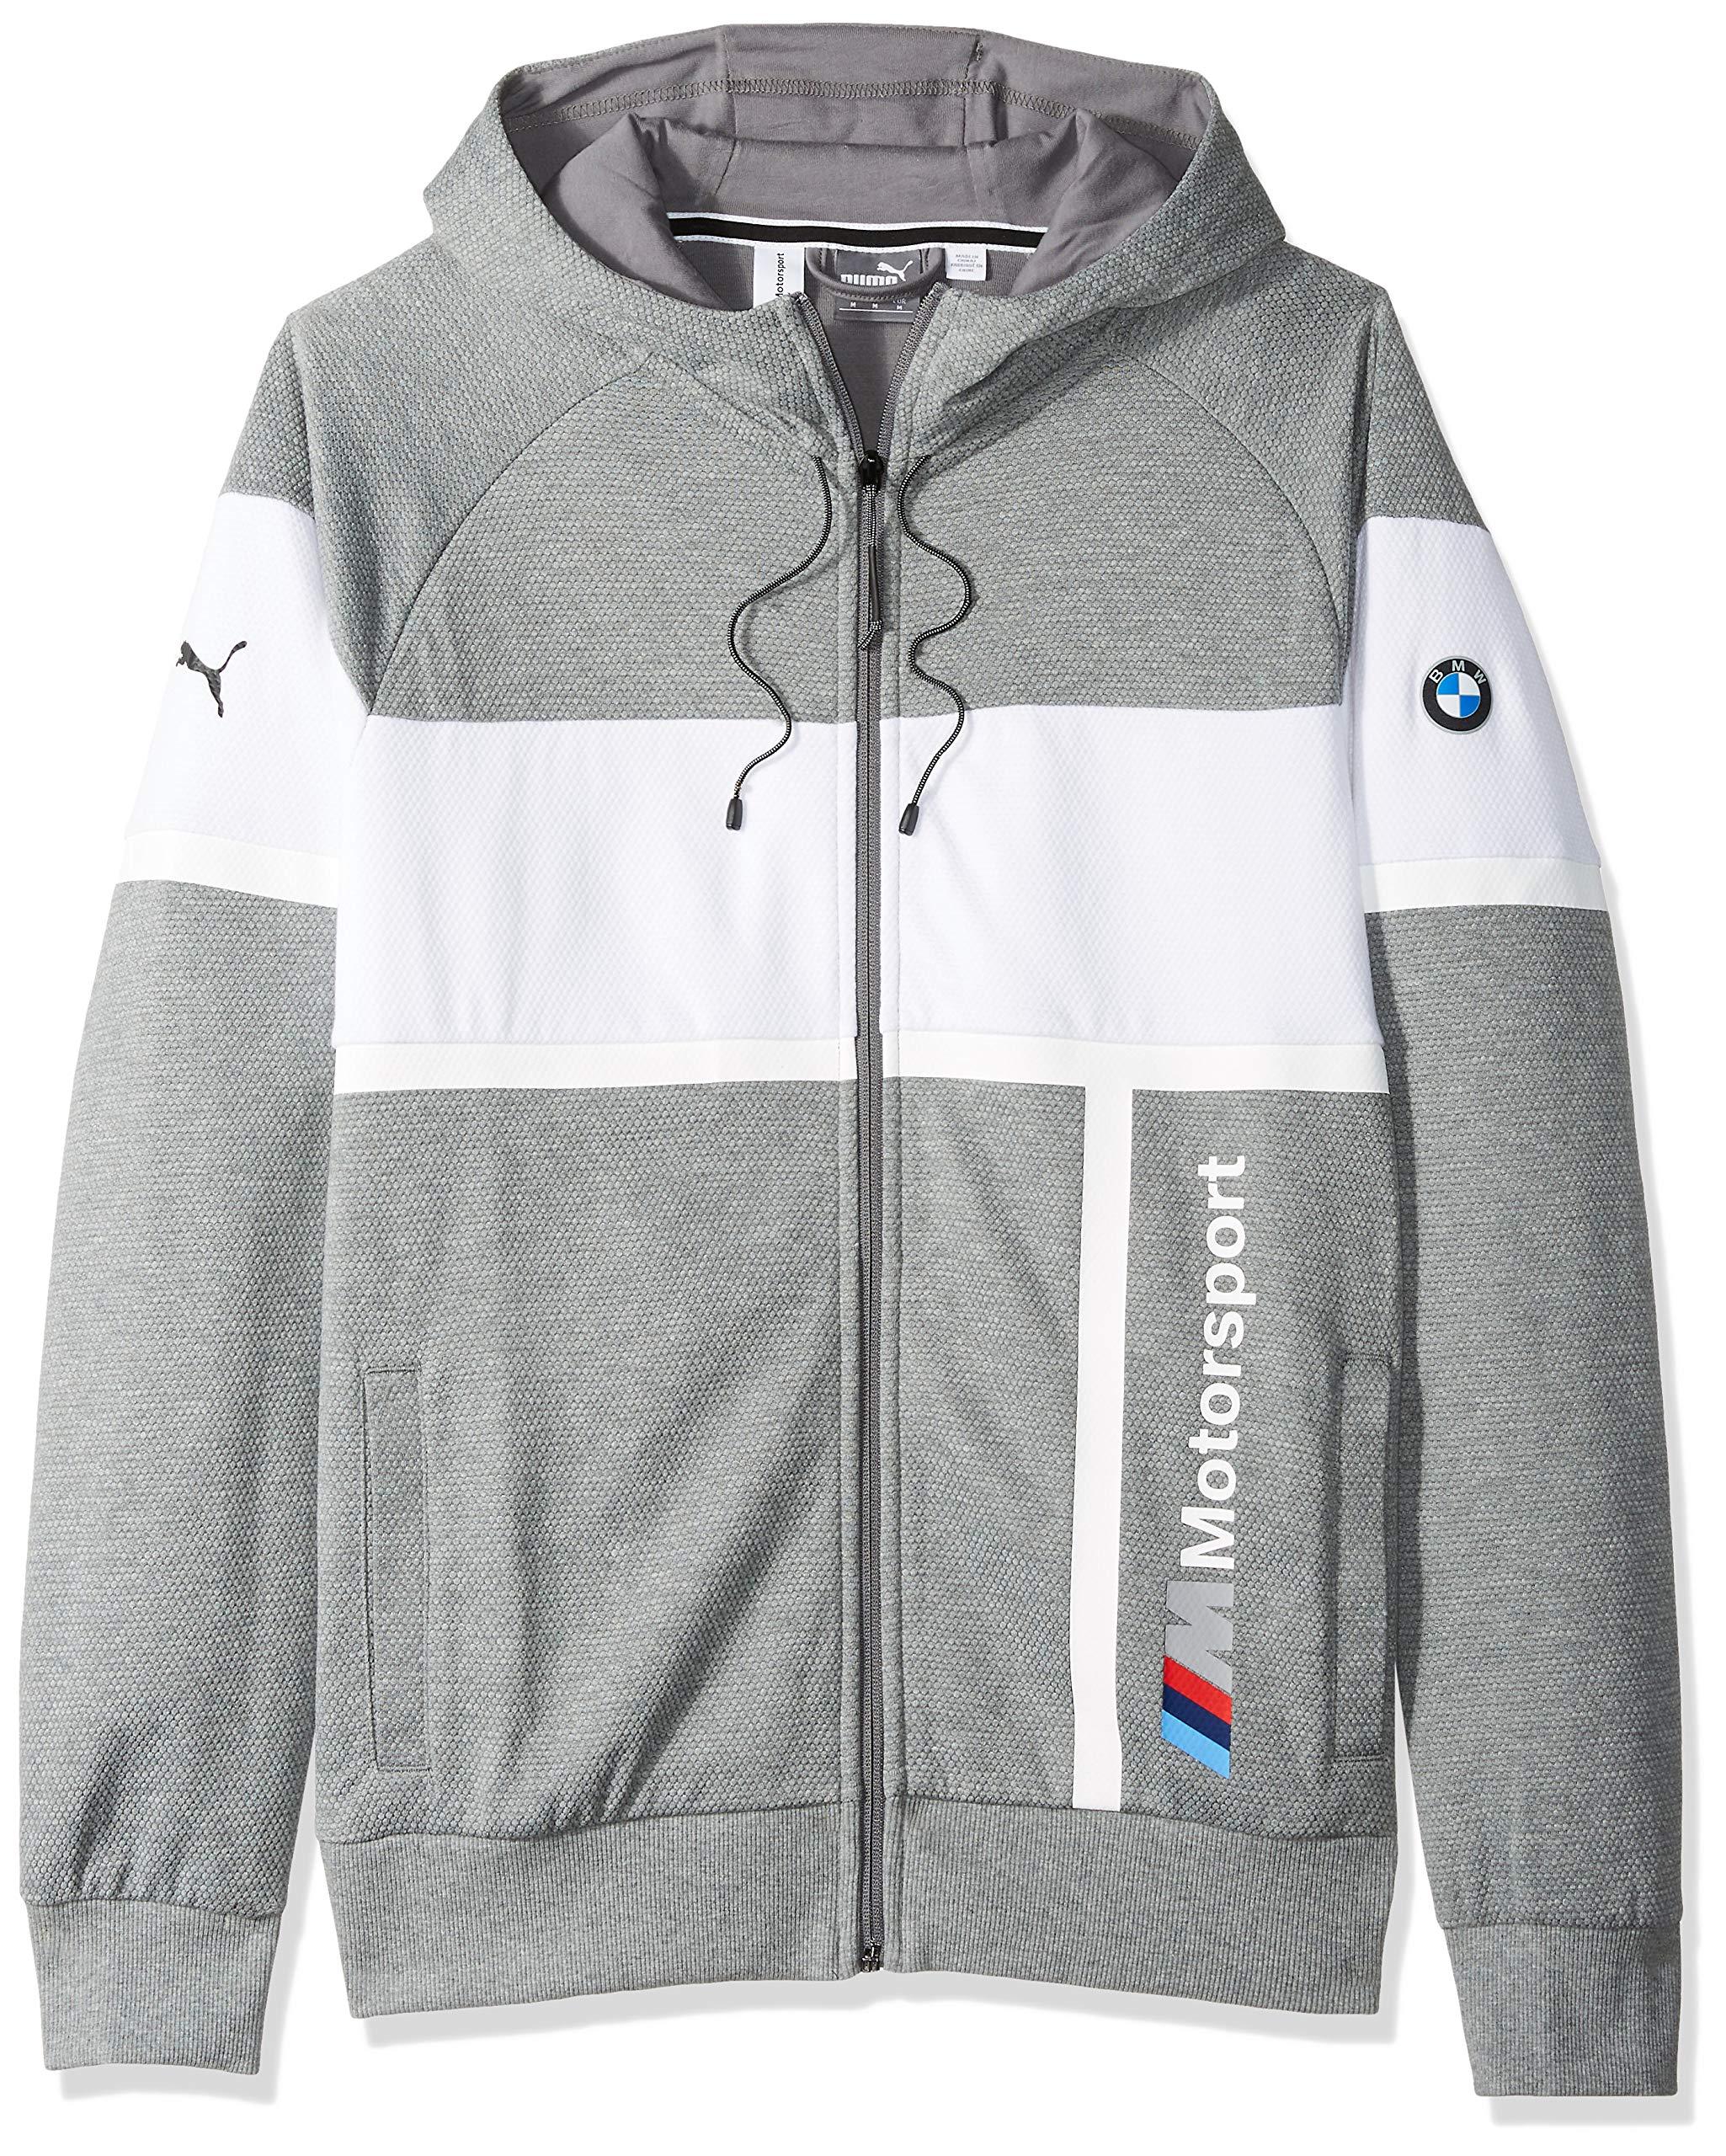 PUMA Men's BMW Motorsport Hooded Sweat Jacket, Medium Gray Heather XX-Large